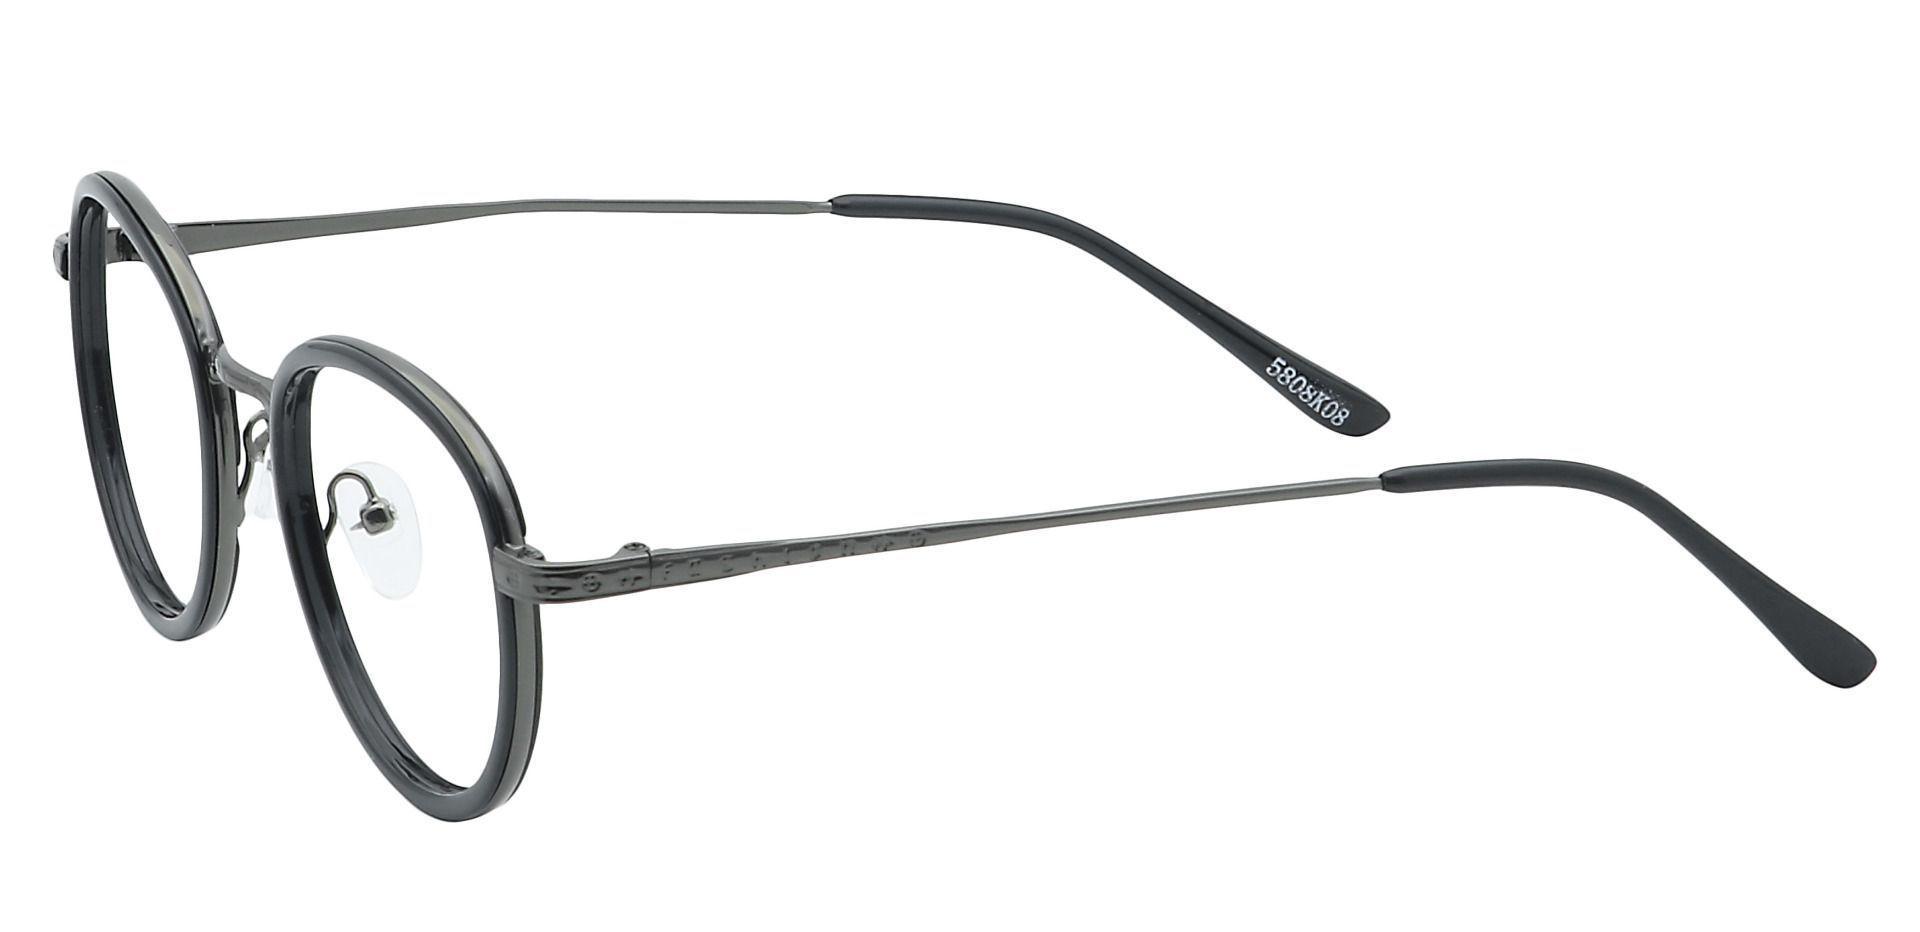 Gage Oval Reading Glasses - Black